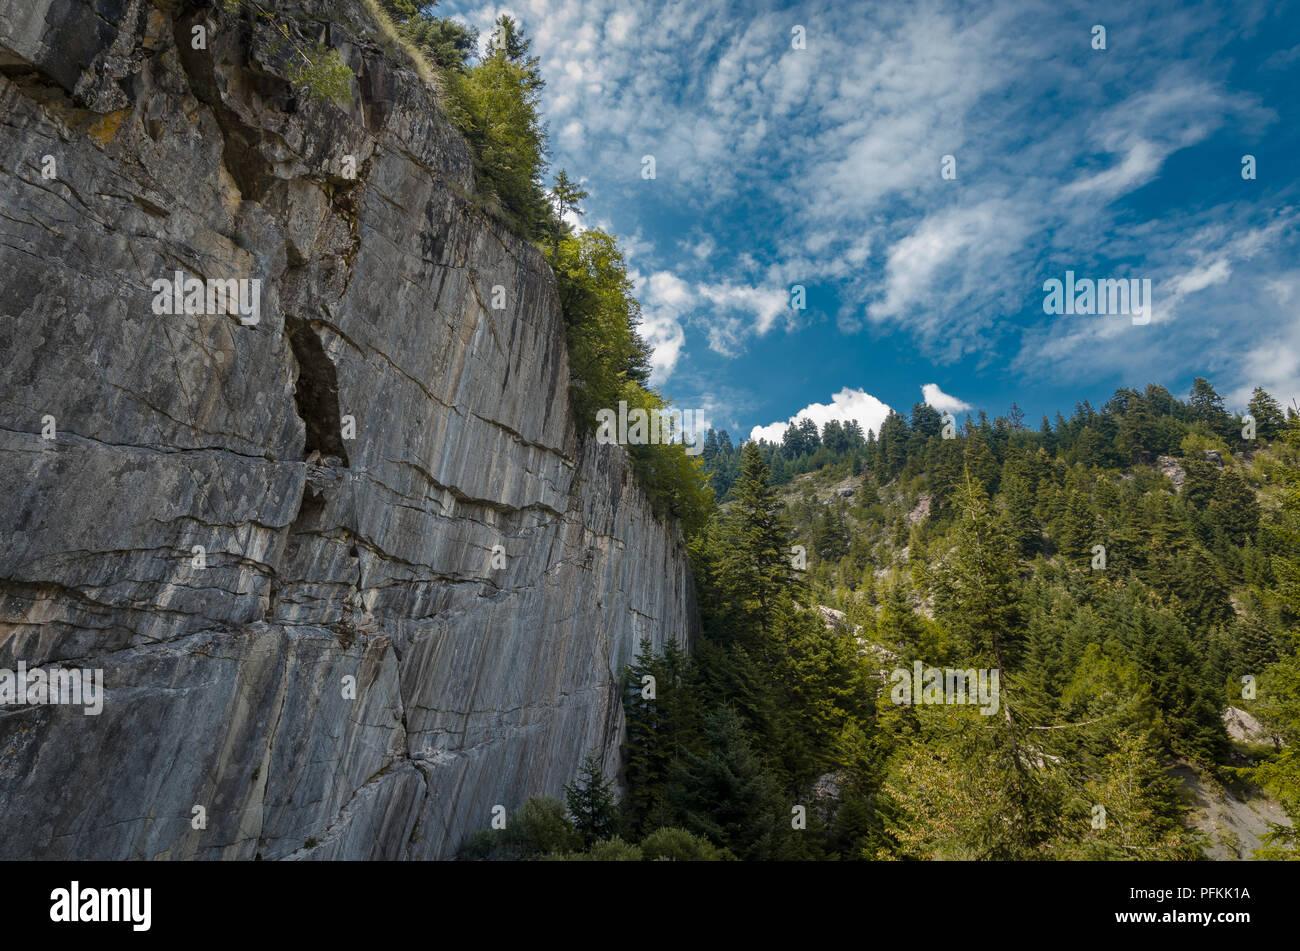 Nature Wallpaper - Stock Image